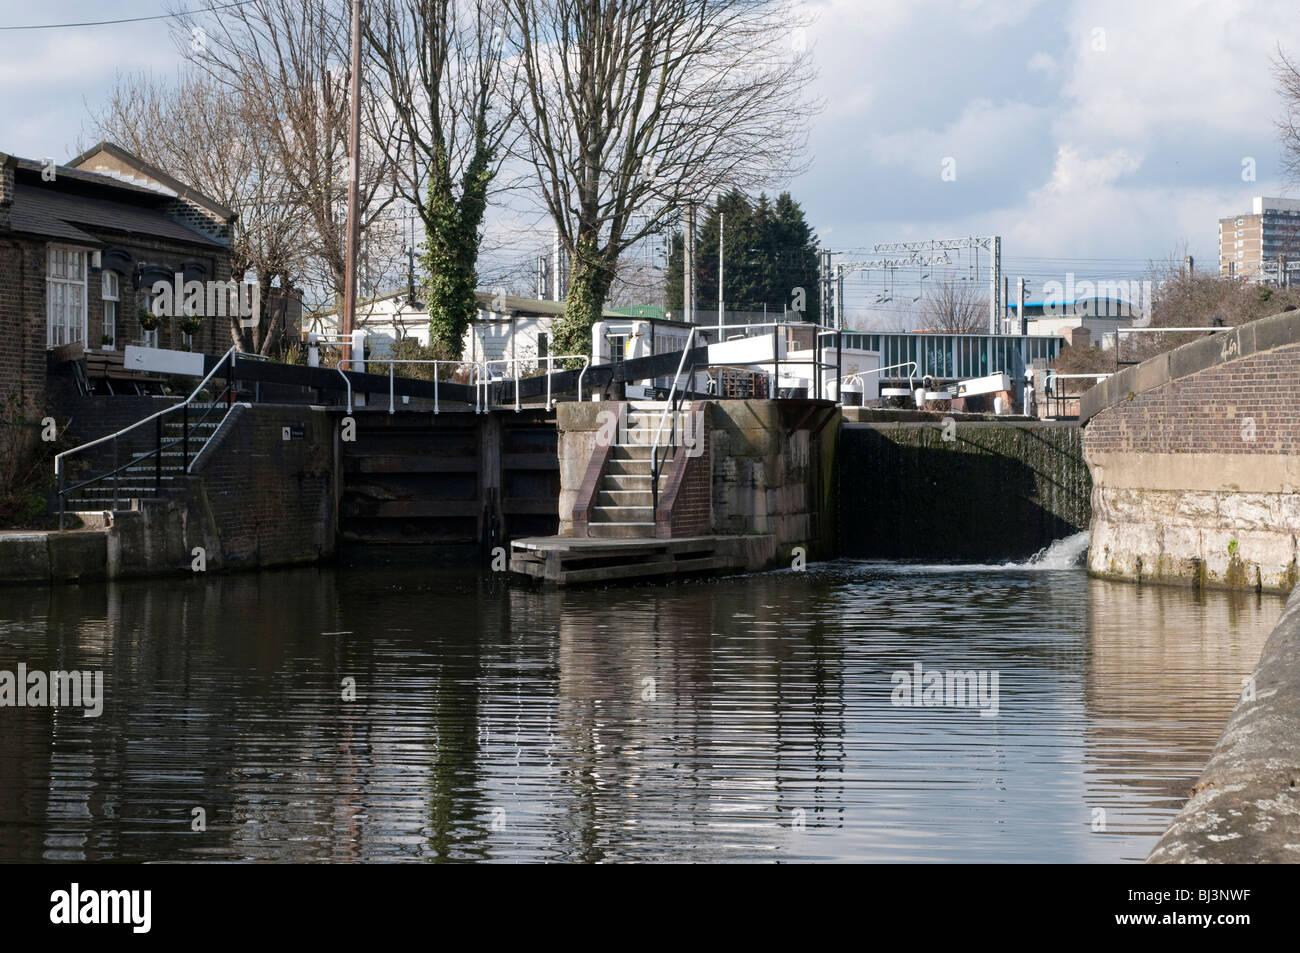 St Pancras Lock on Regents Canal, Kings Cross, London, UK - Stock Image